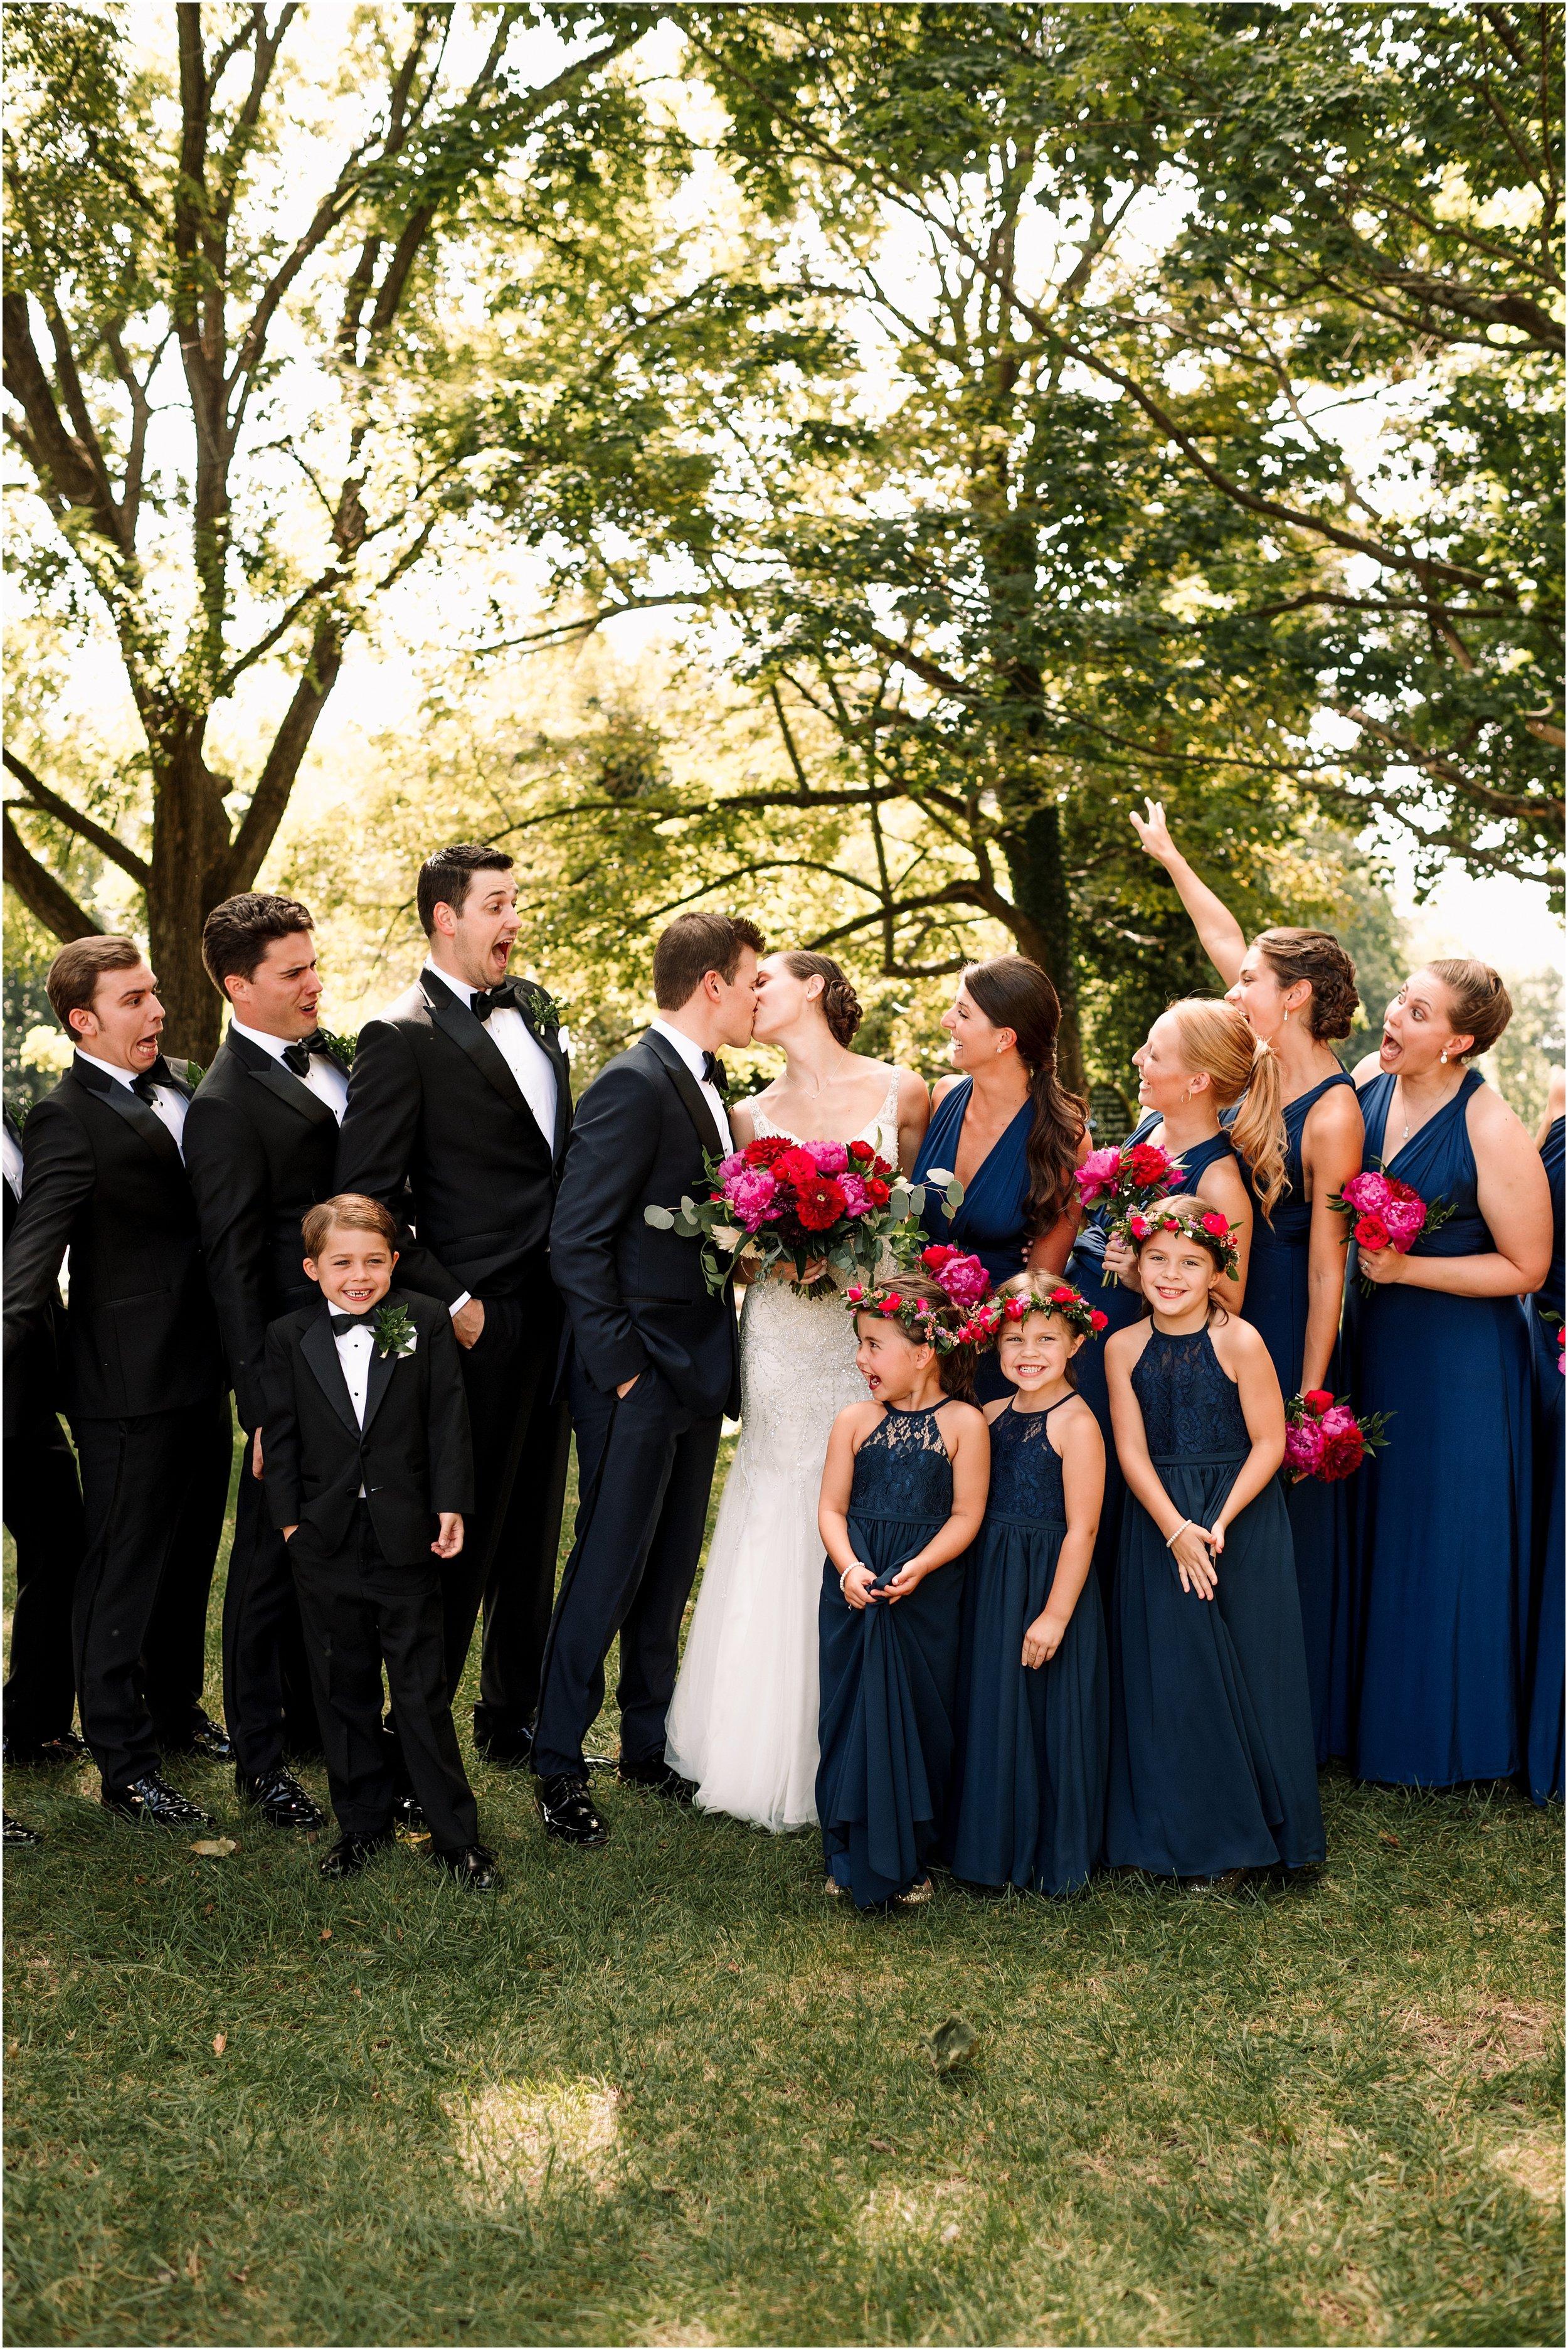 hannah leigh photography Antrim 1844 Wedding_1194.jpg